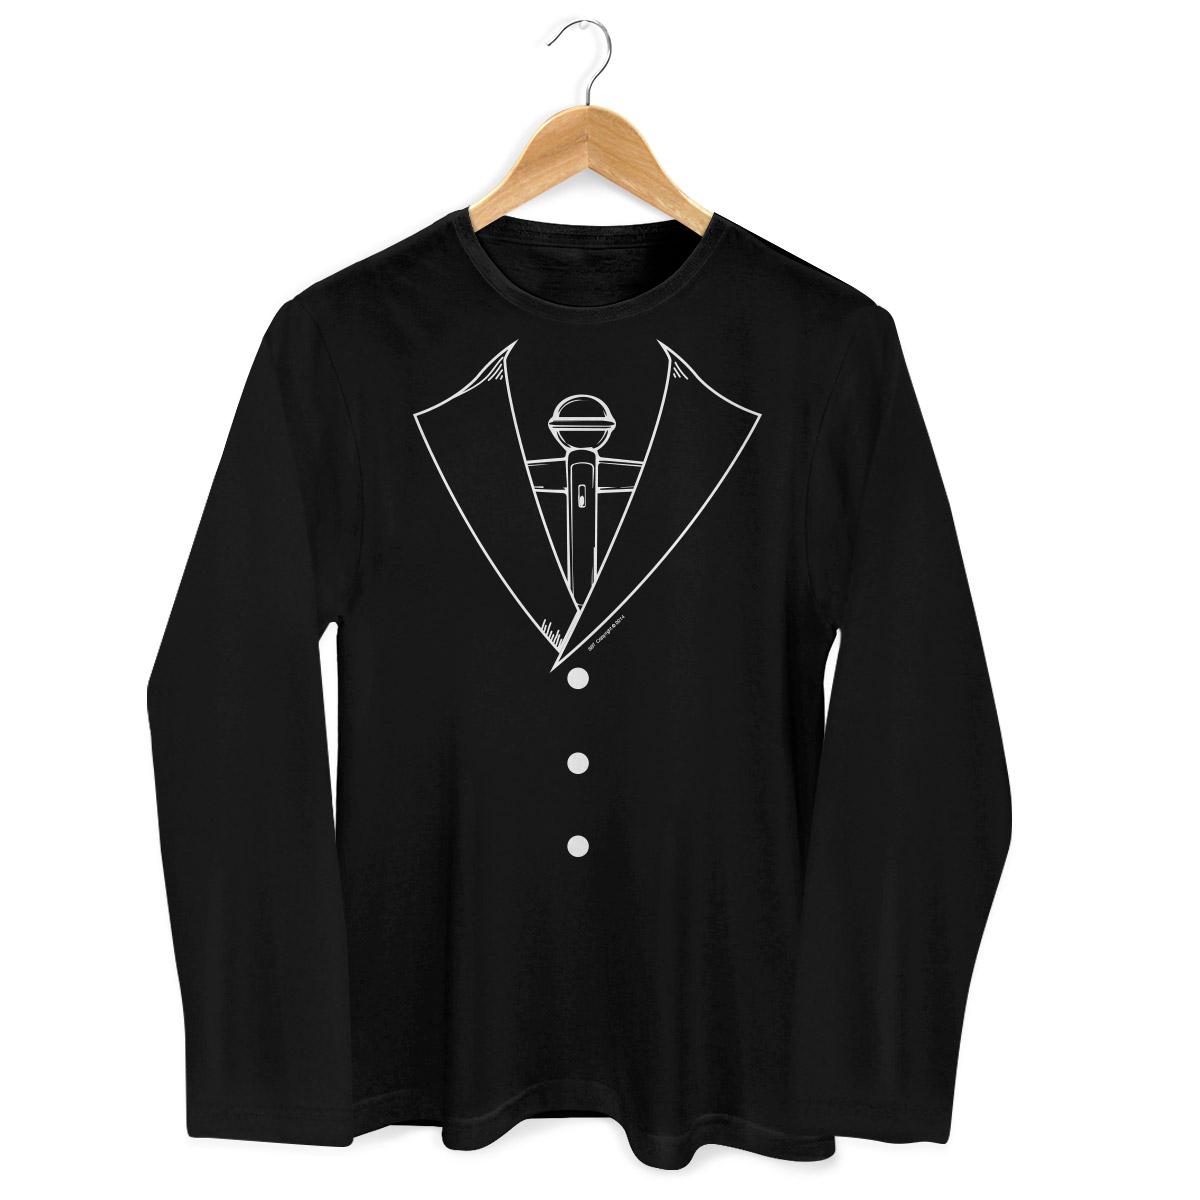 Camiseta Masculina de Manga Longa SBT Microfone